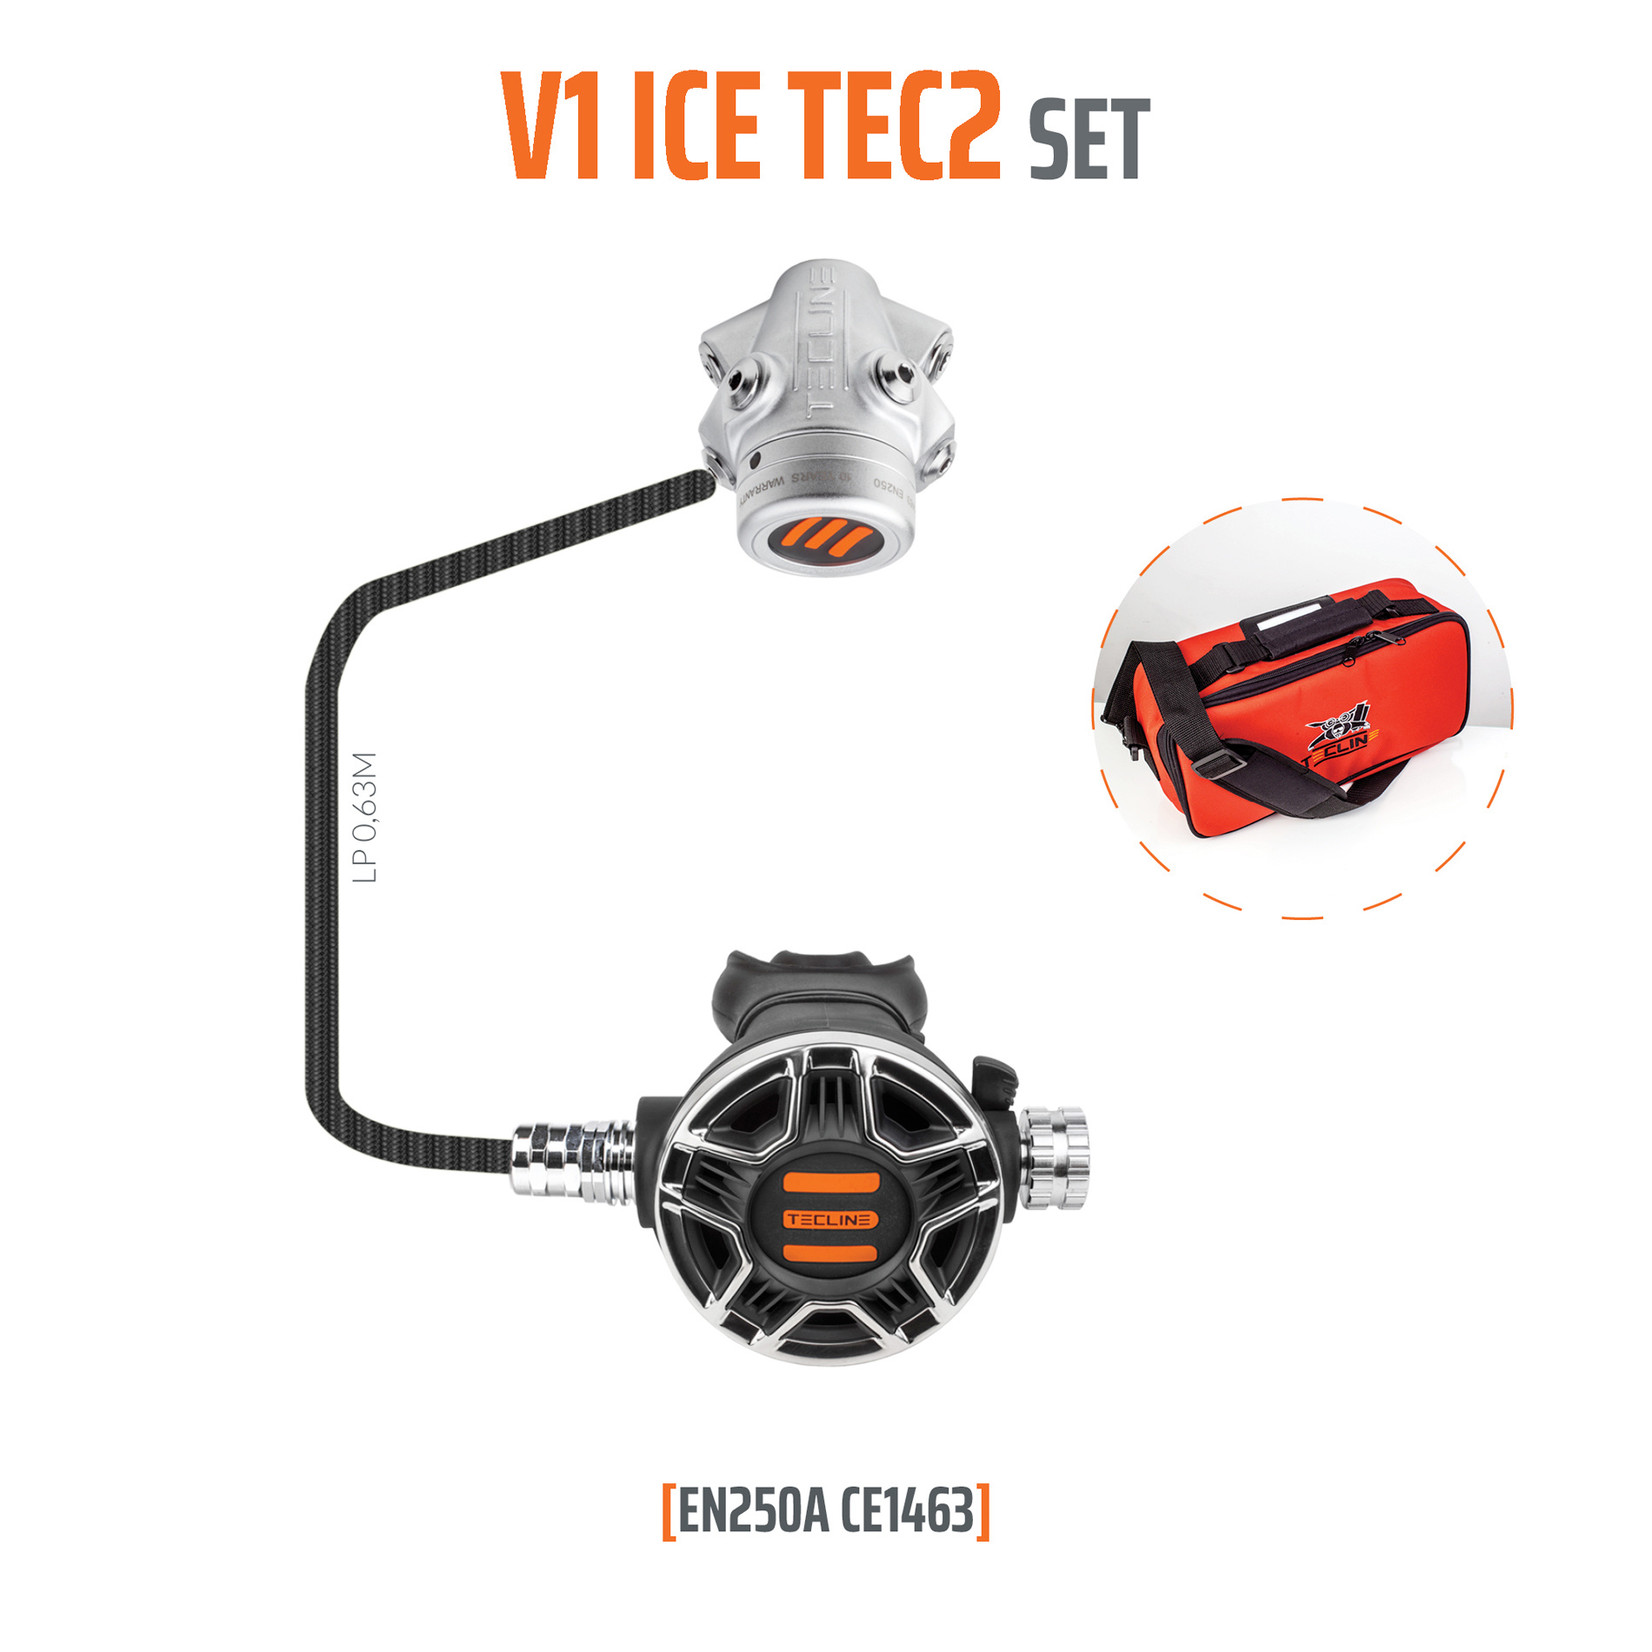 Tecline Regulator V1 ICE TEC2 - EN250A